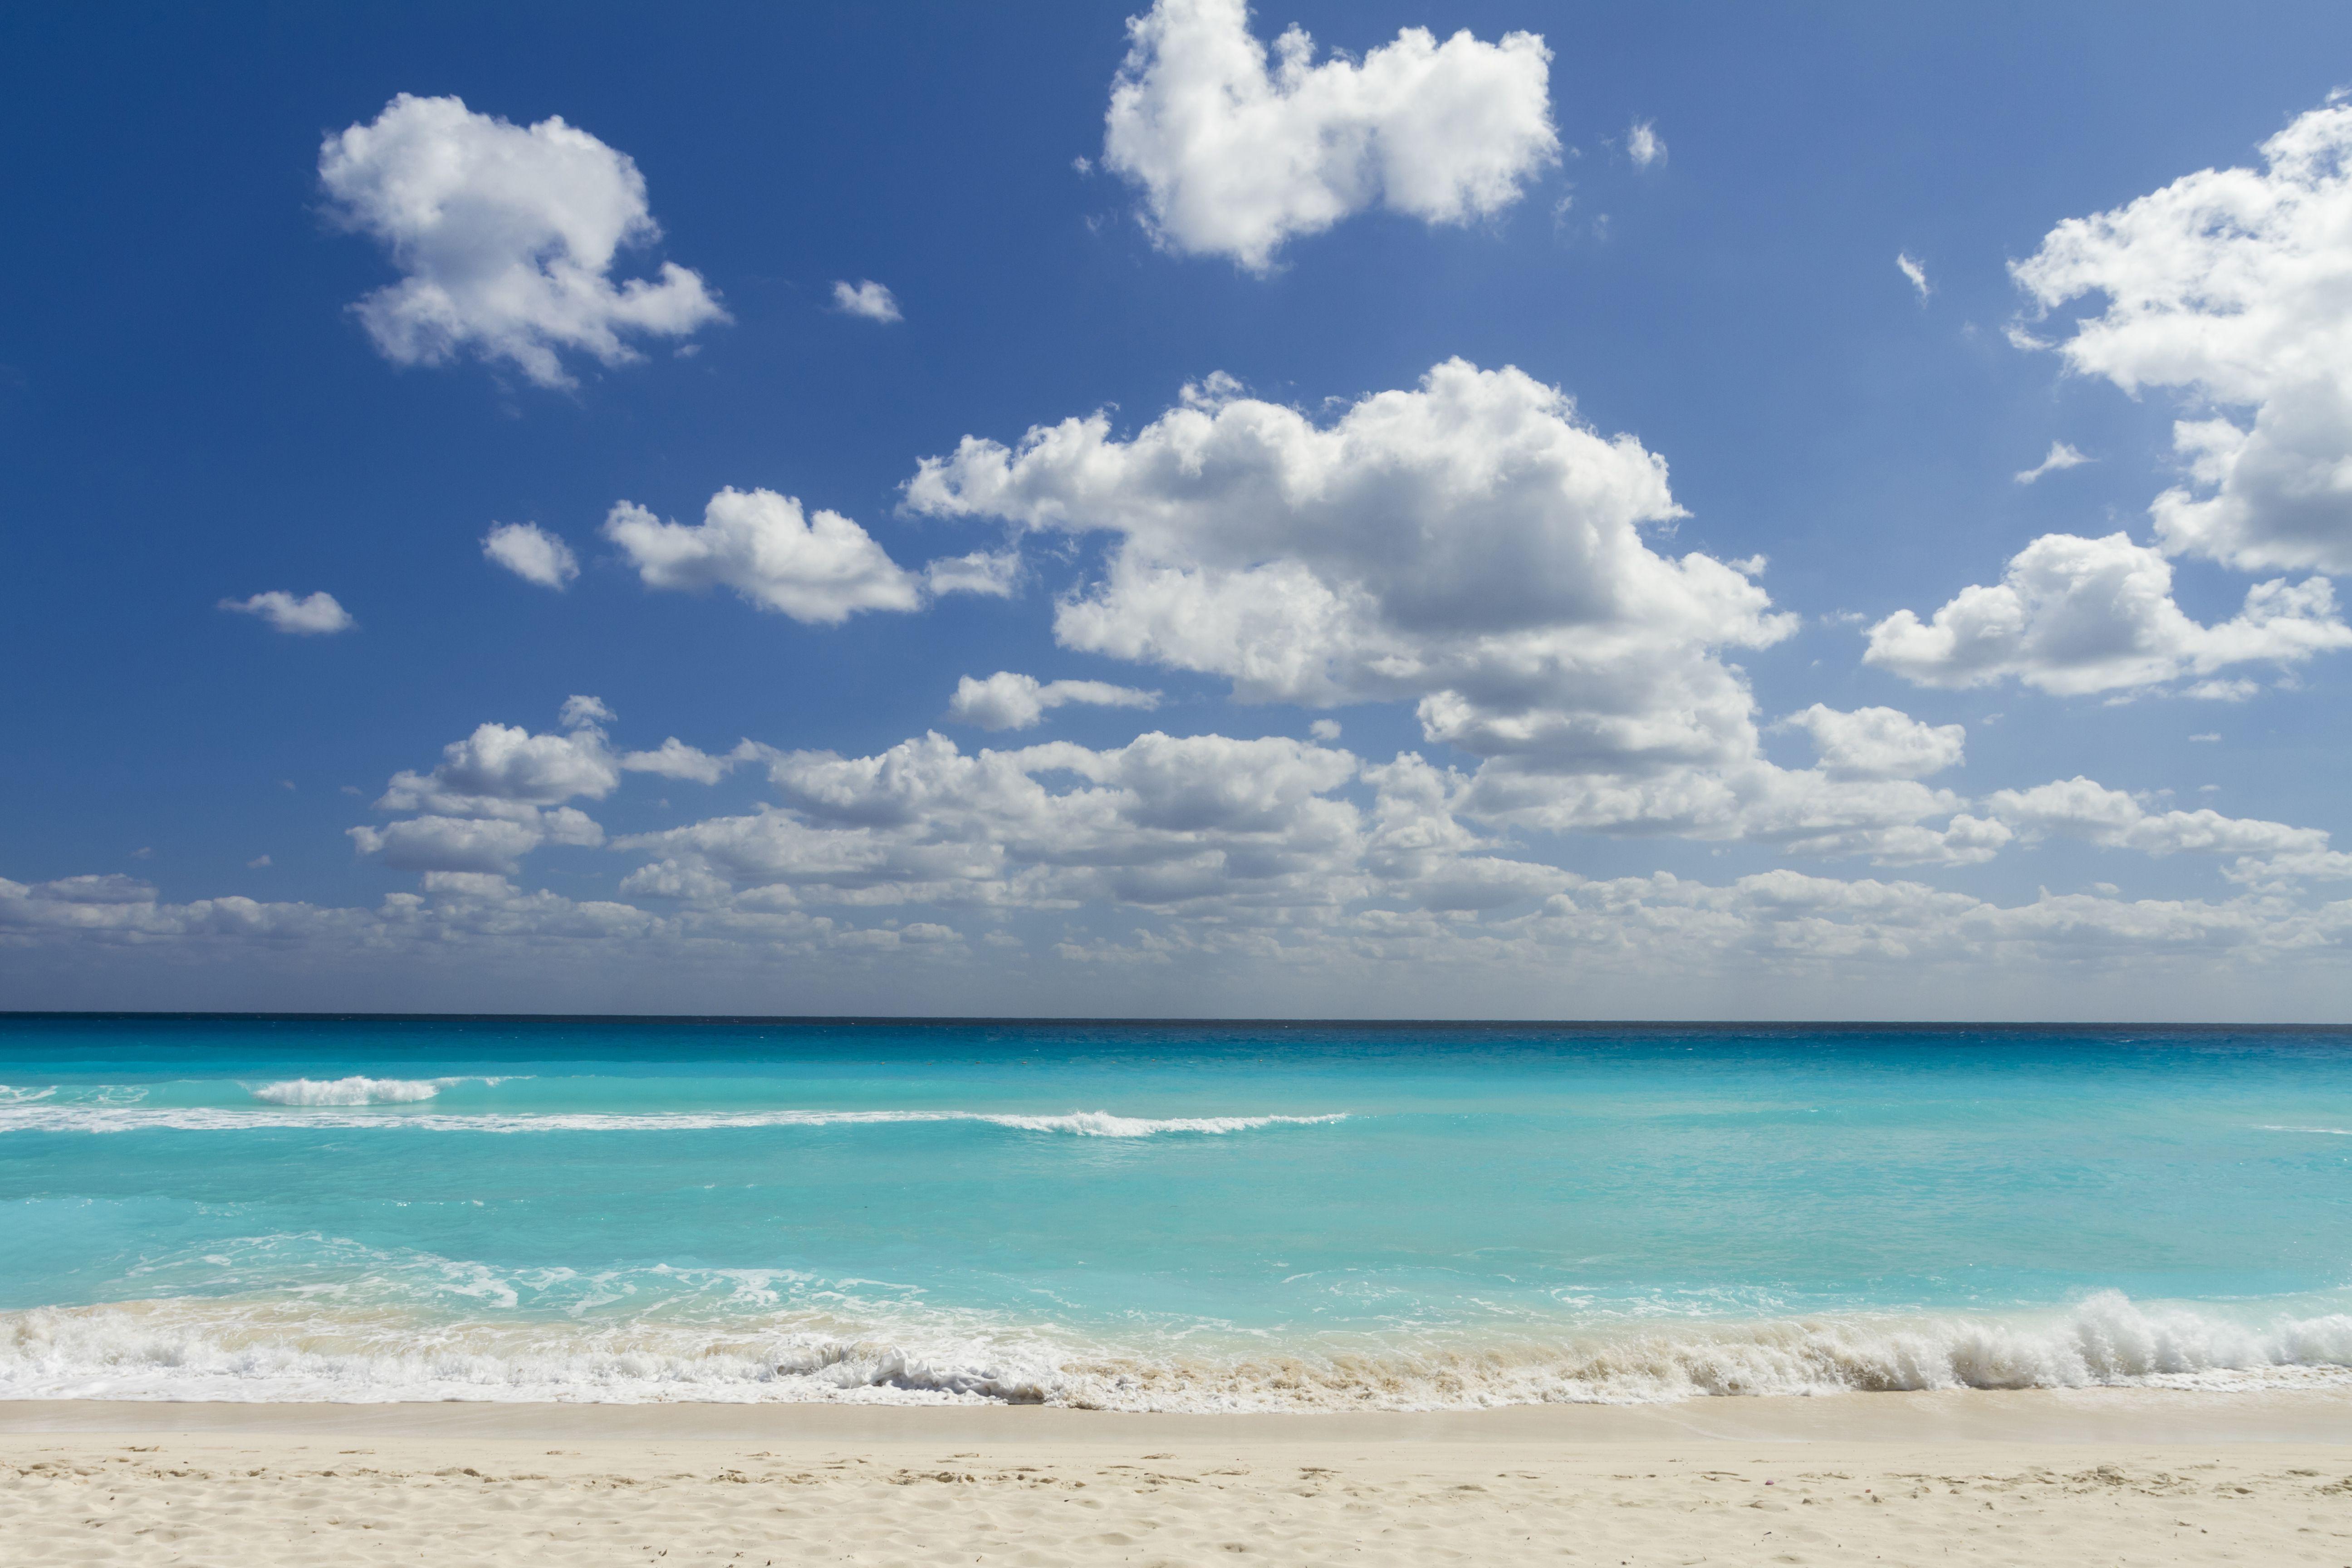 What's your favorite color? At #SandosCancun you'll be blown away by our fine white sand and turquoise water.   ¿Cuál es tu color favorito? En #SandosCancun vas a quedar fascinado de con nuestra fina arena blanca y agua turquesa.